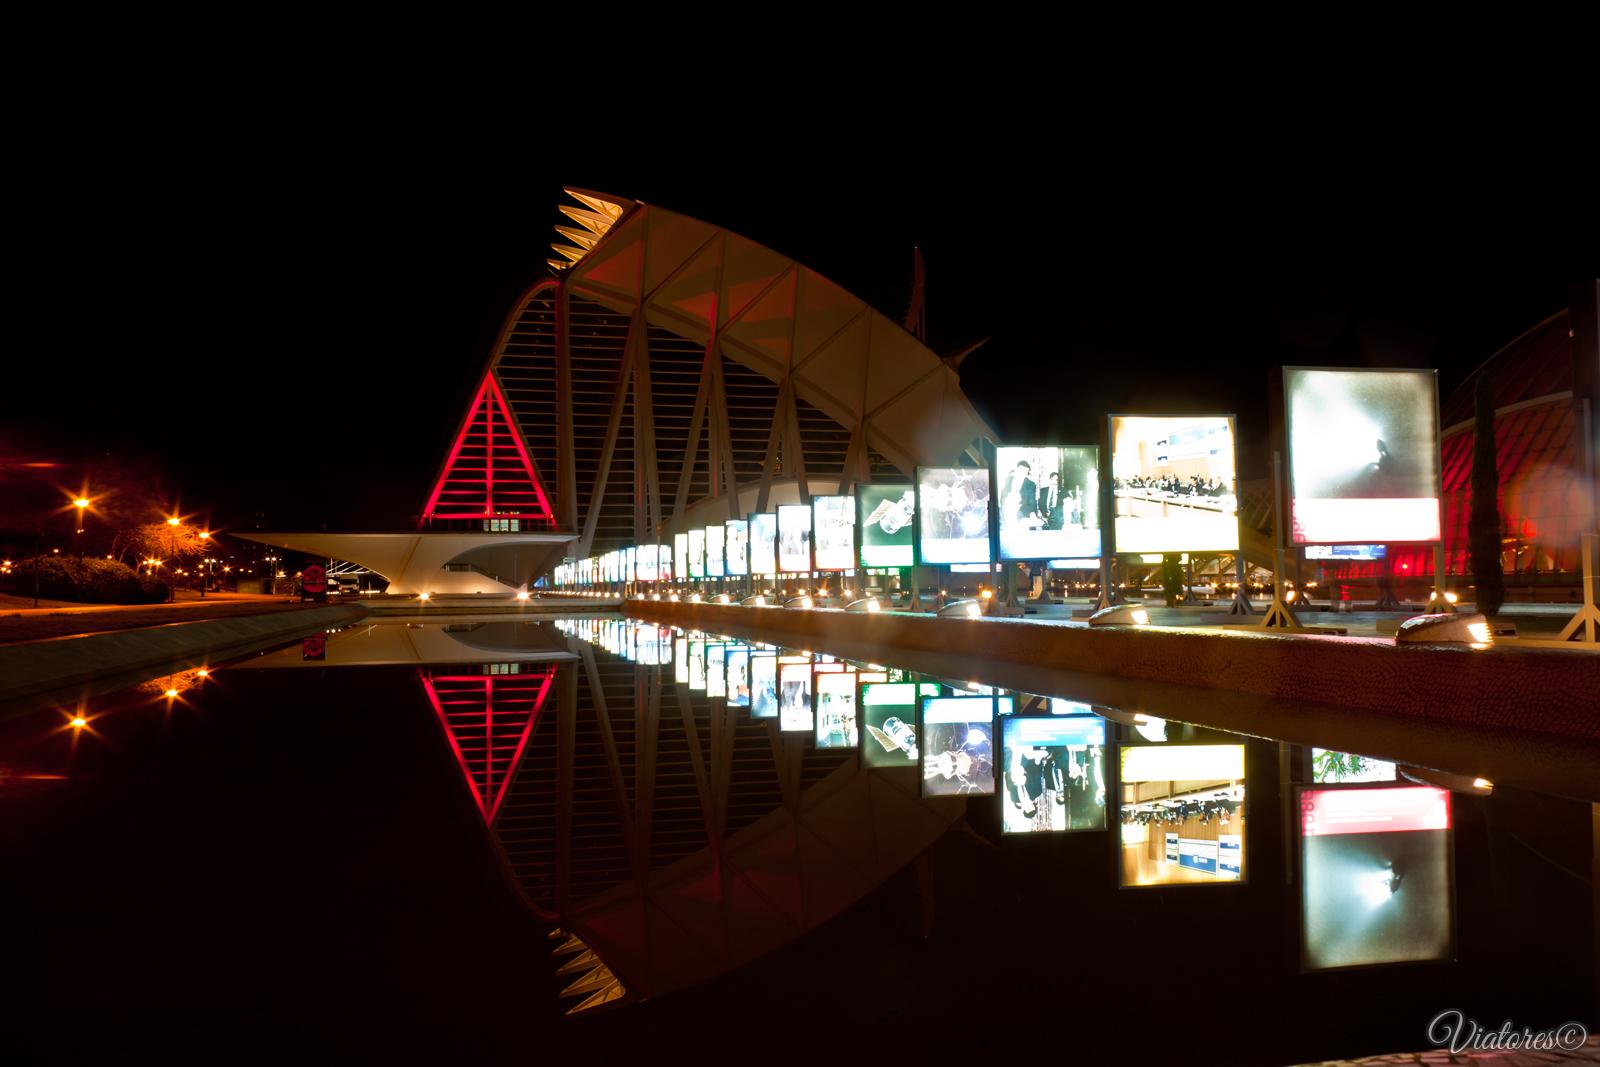 Museu de les Ciències Príncipe Felipe. Valencia. Spain